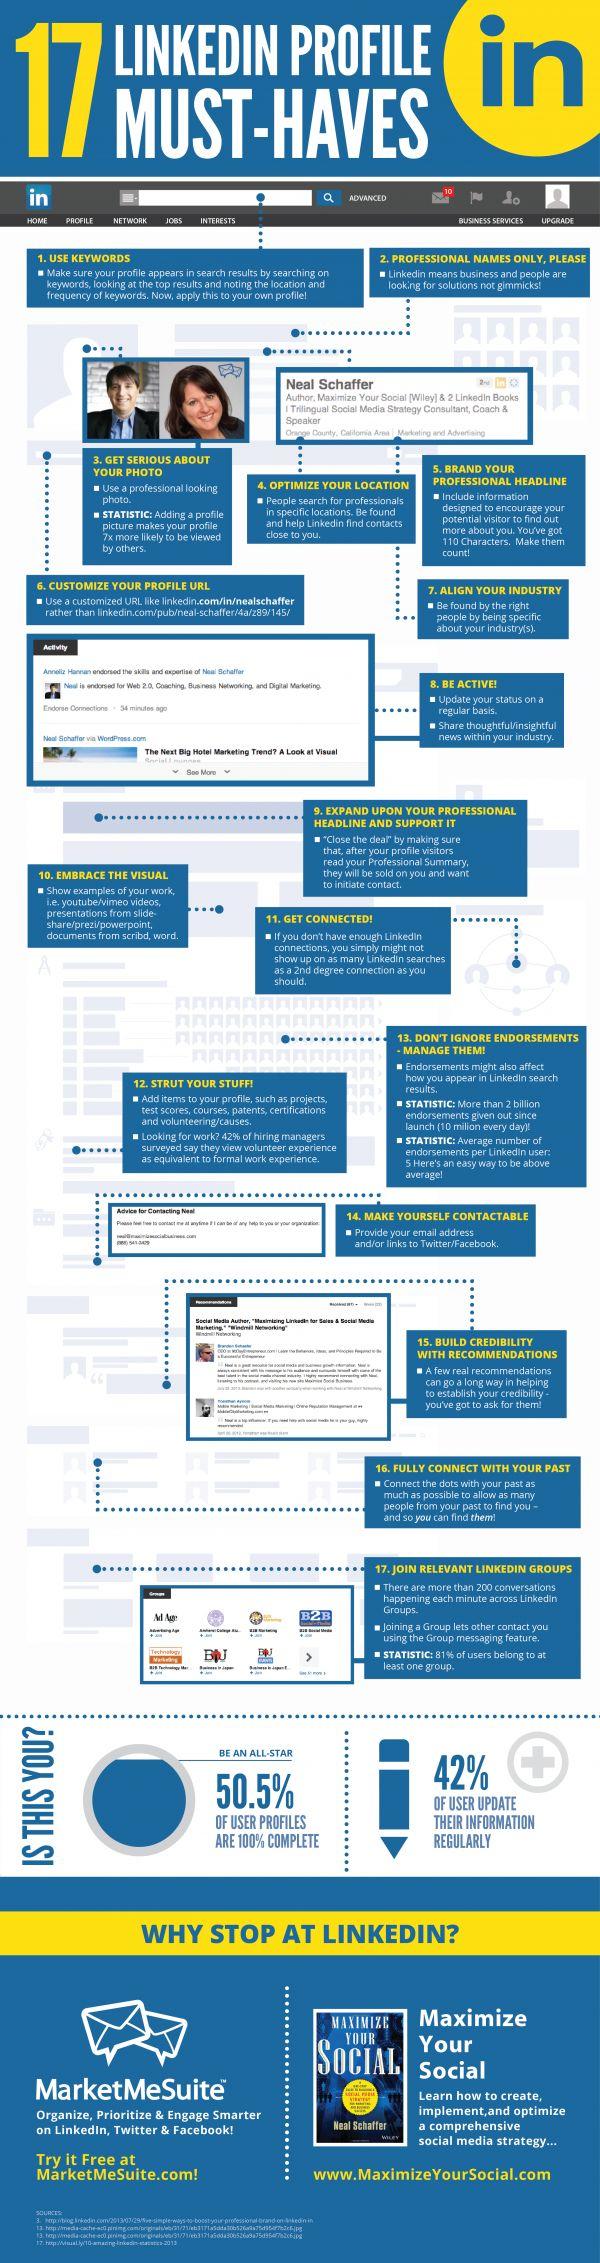 17 consejos para optimizar tu perfil de Linkedin